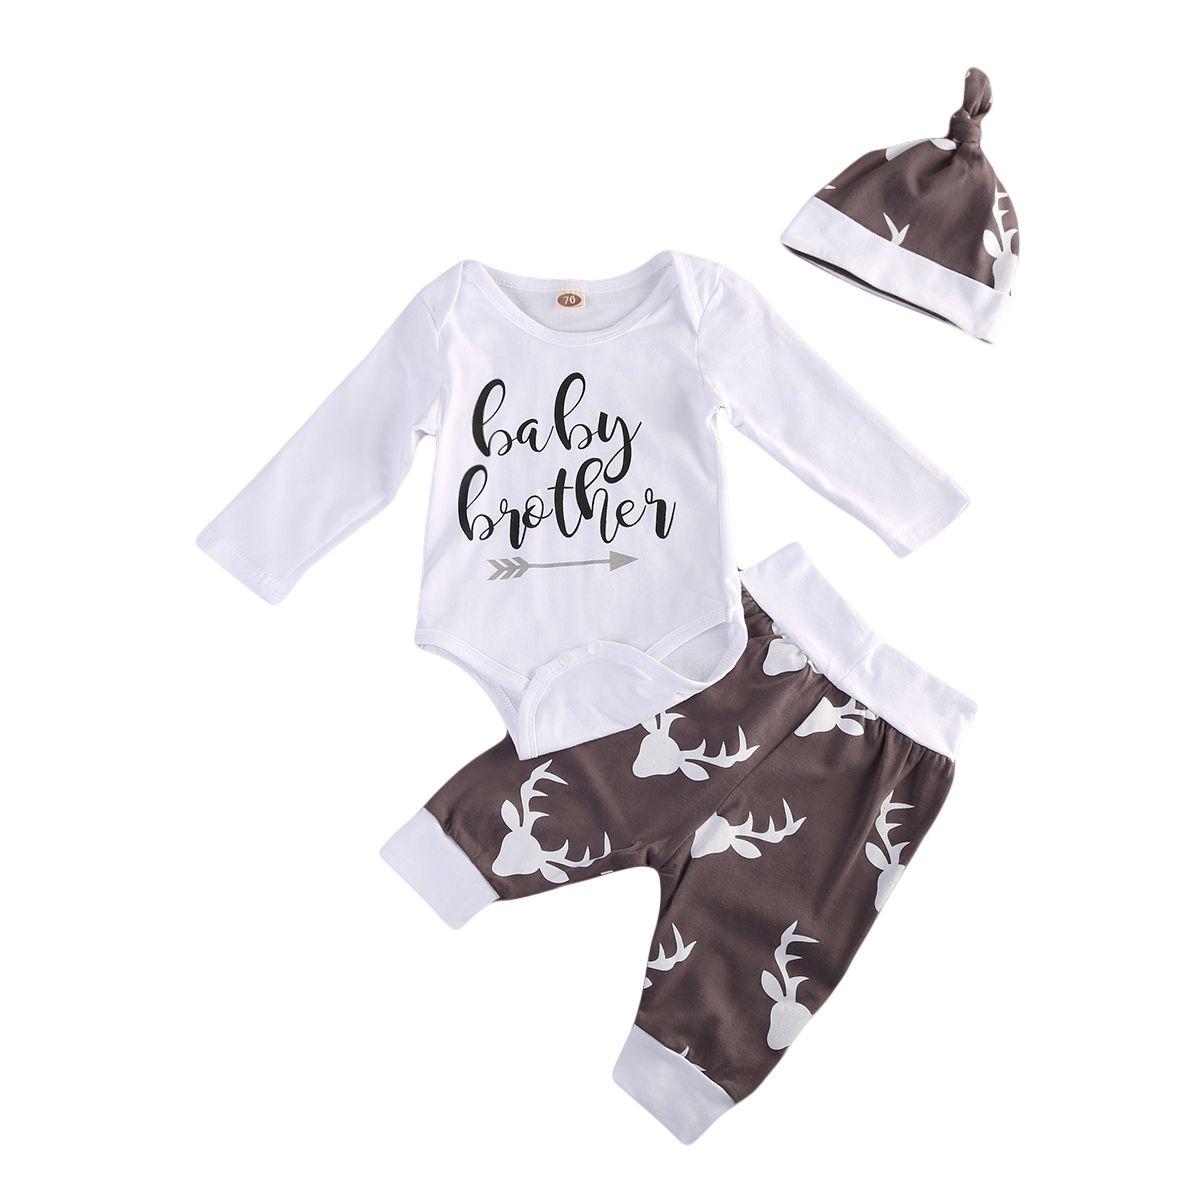 bc169929e 3Pcs Set Newborn Infant Toddler Baby Boys Christmas Xmas Clothes ...